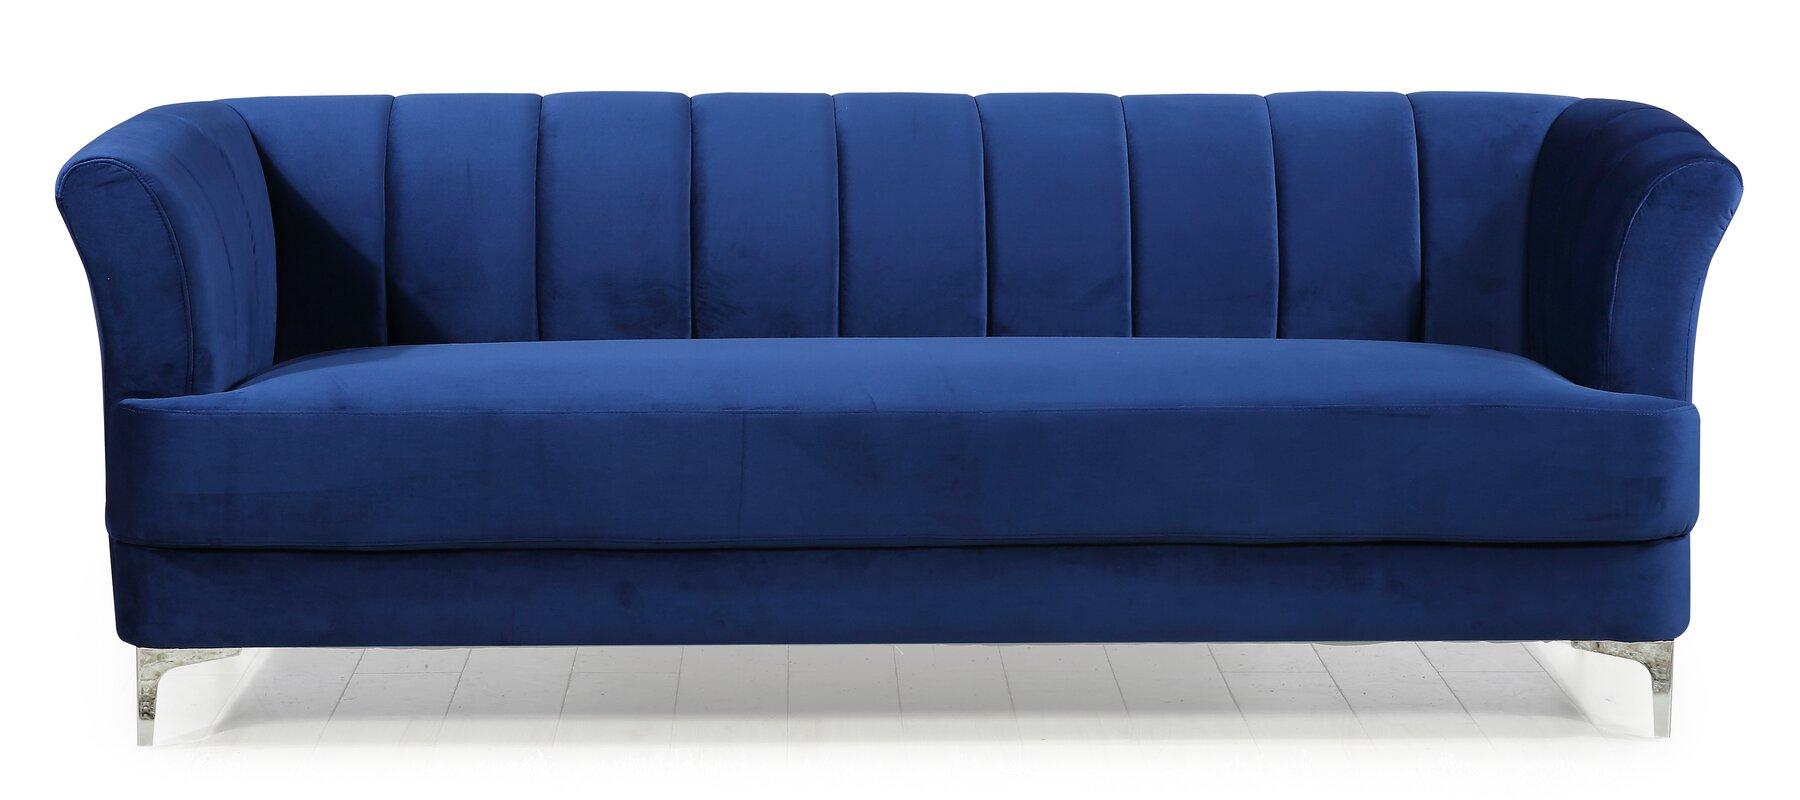 Danette Elegant Classic Chesterfield Sofa